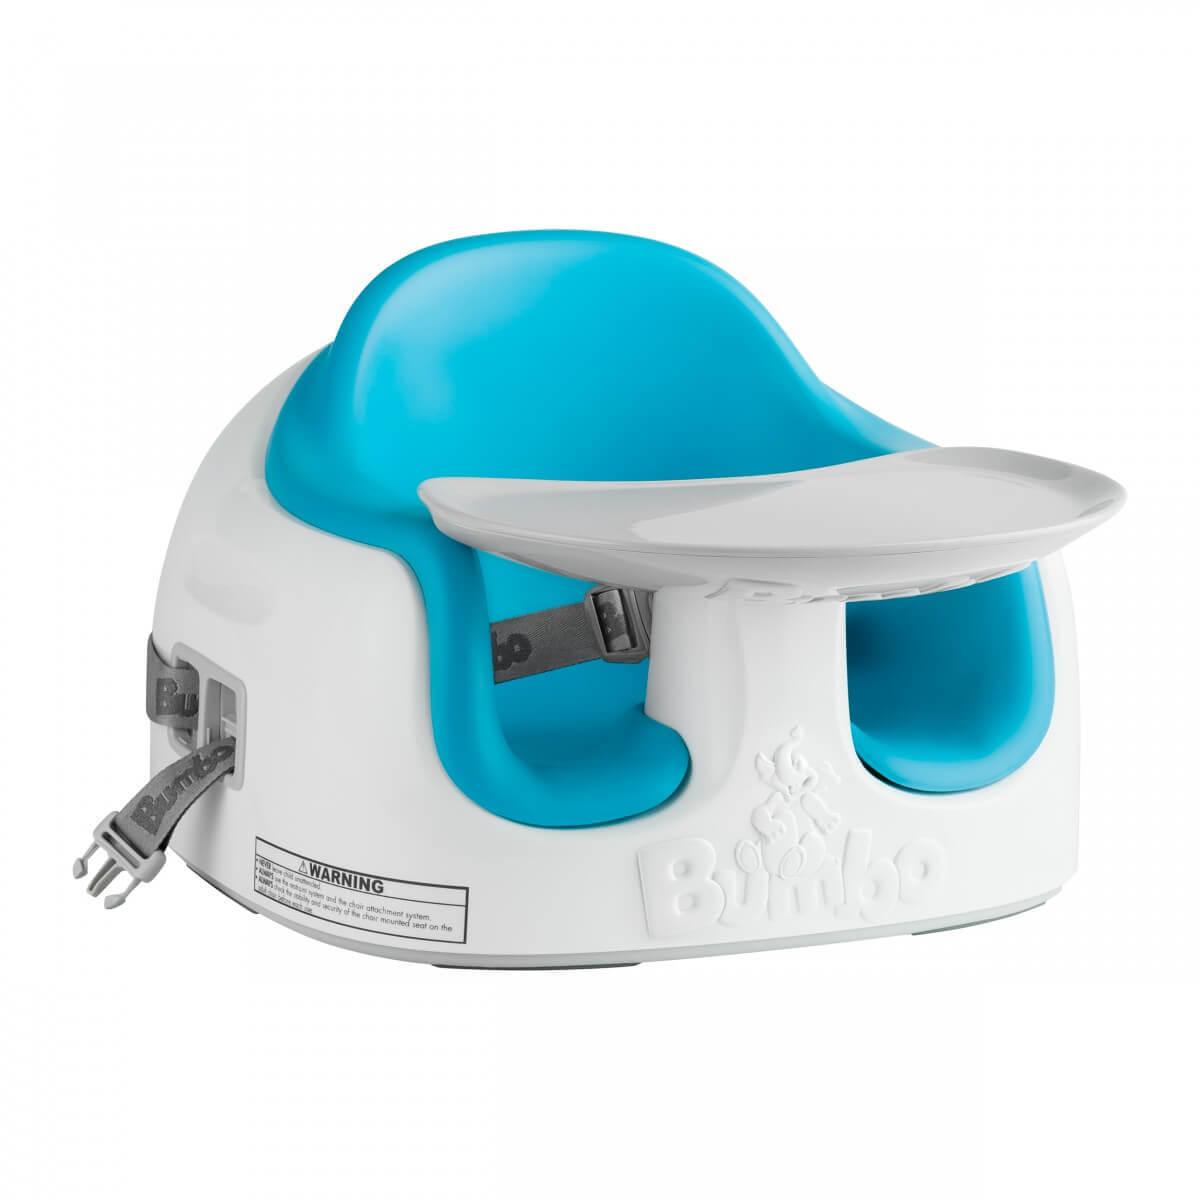 Bumbo Multi Seat Blue Booster